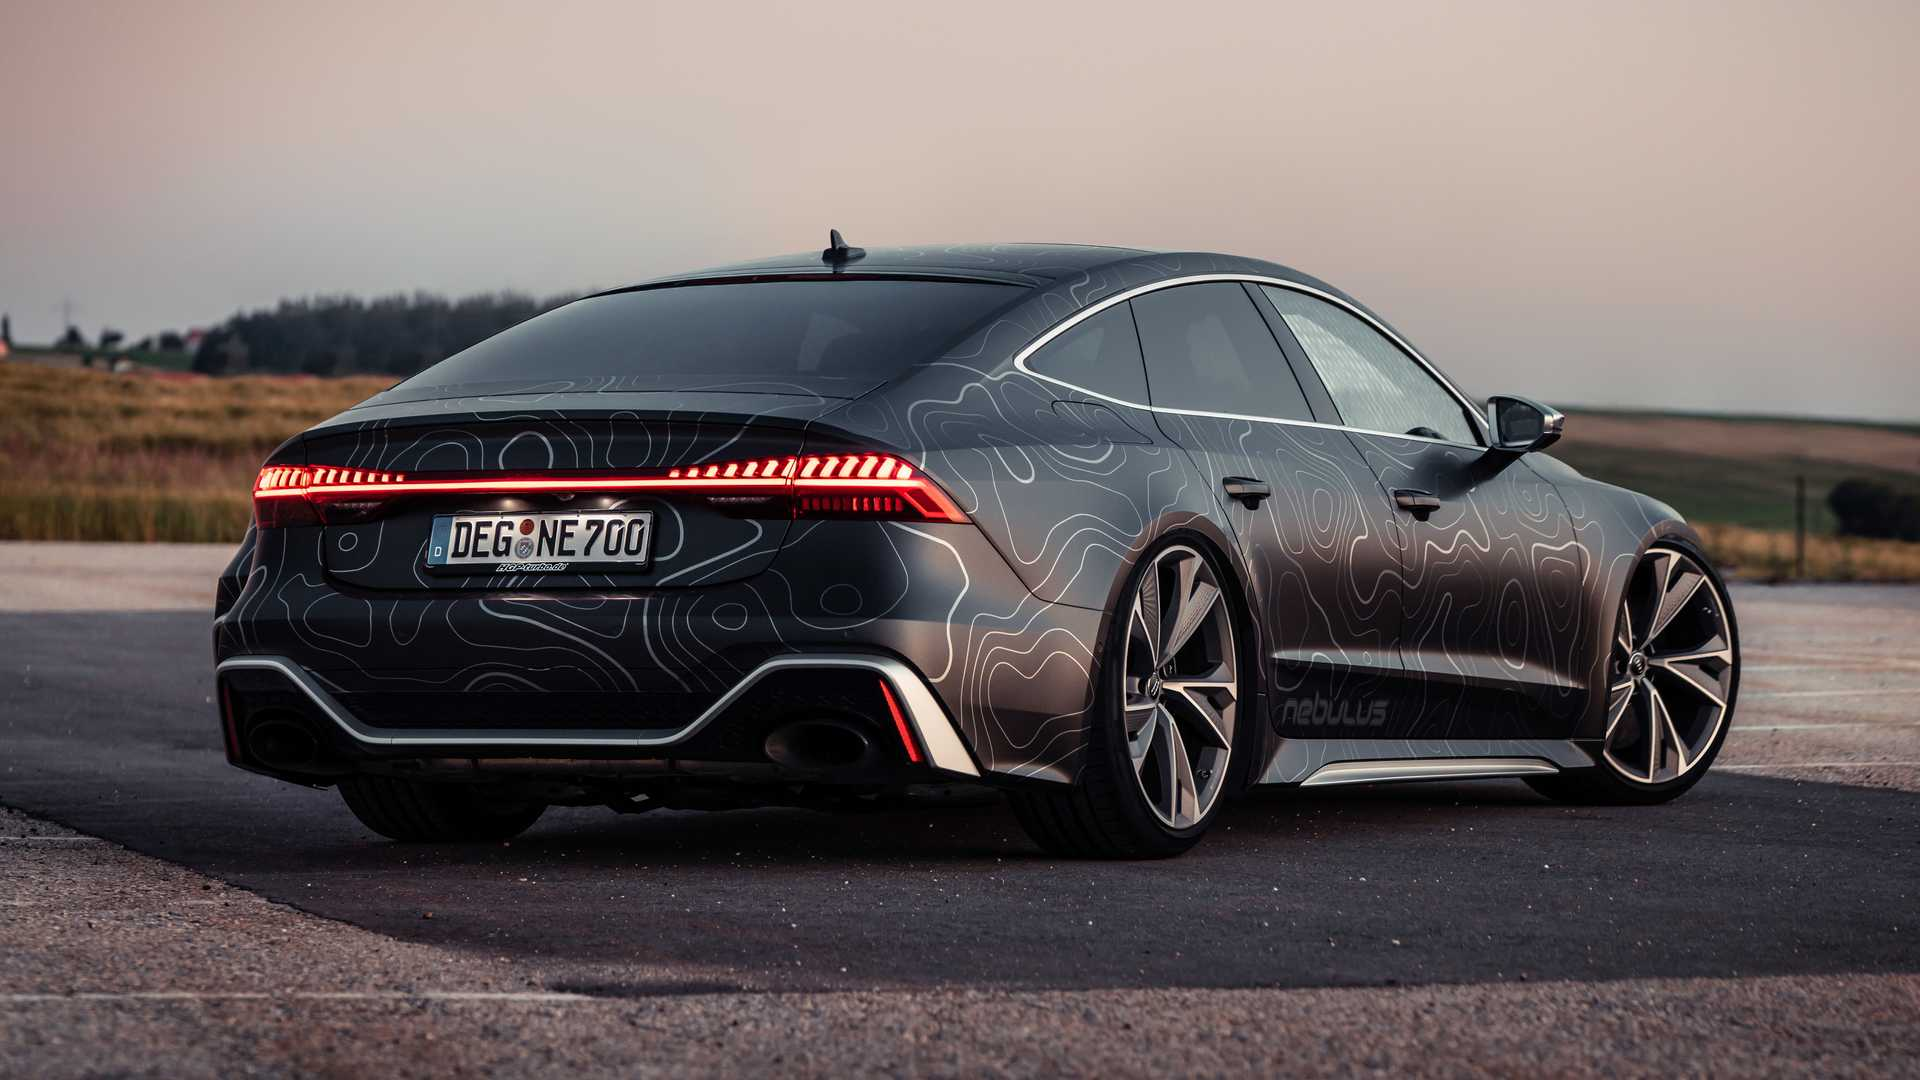 Audi-RS7-By-Black-Box-Richter-13